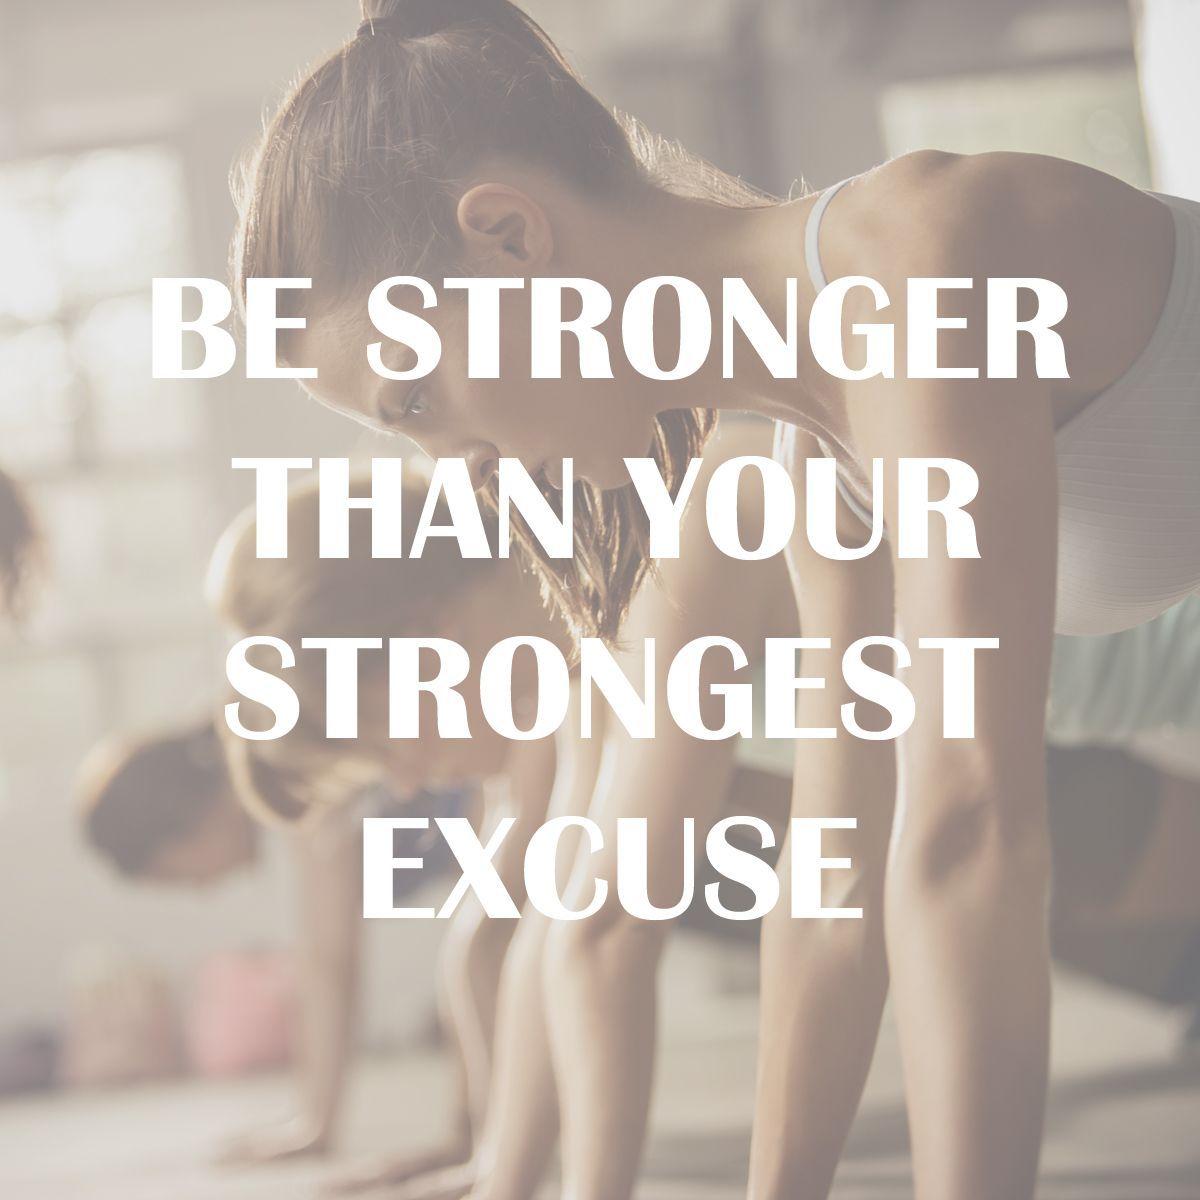 #wwwokgethealthycom #okgethealthy #motivation #northville #strongest #stronger #trainer #fitness #wo...